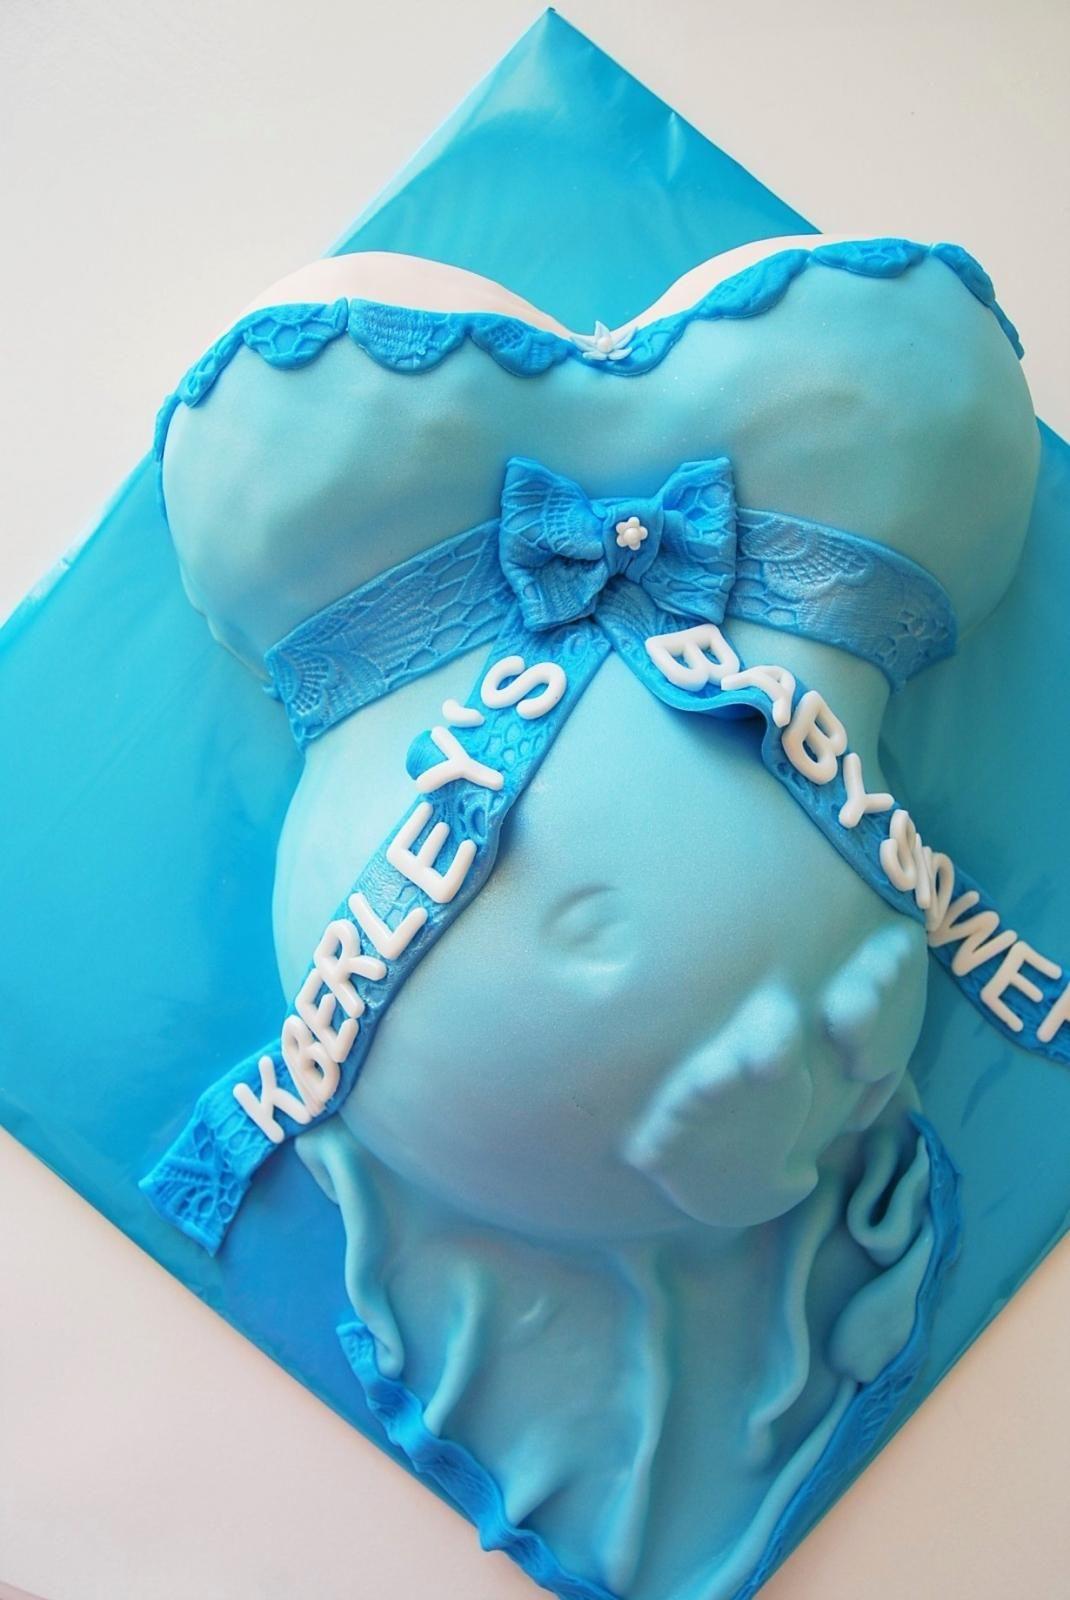 babybelly cake